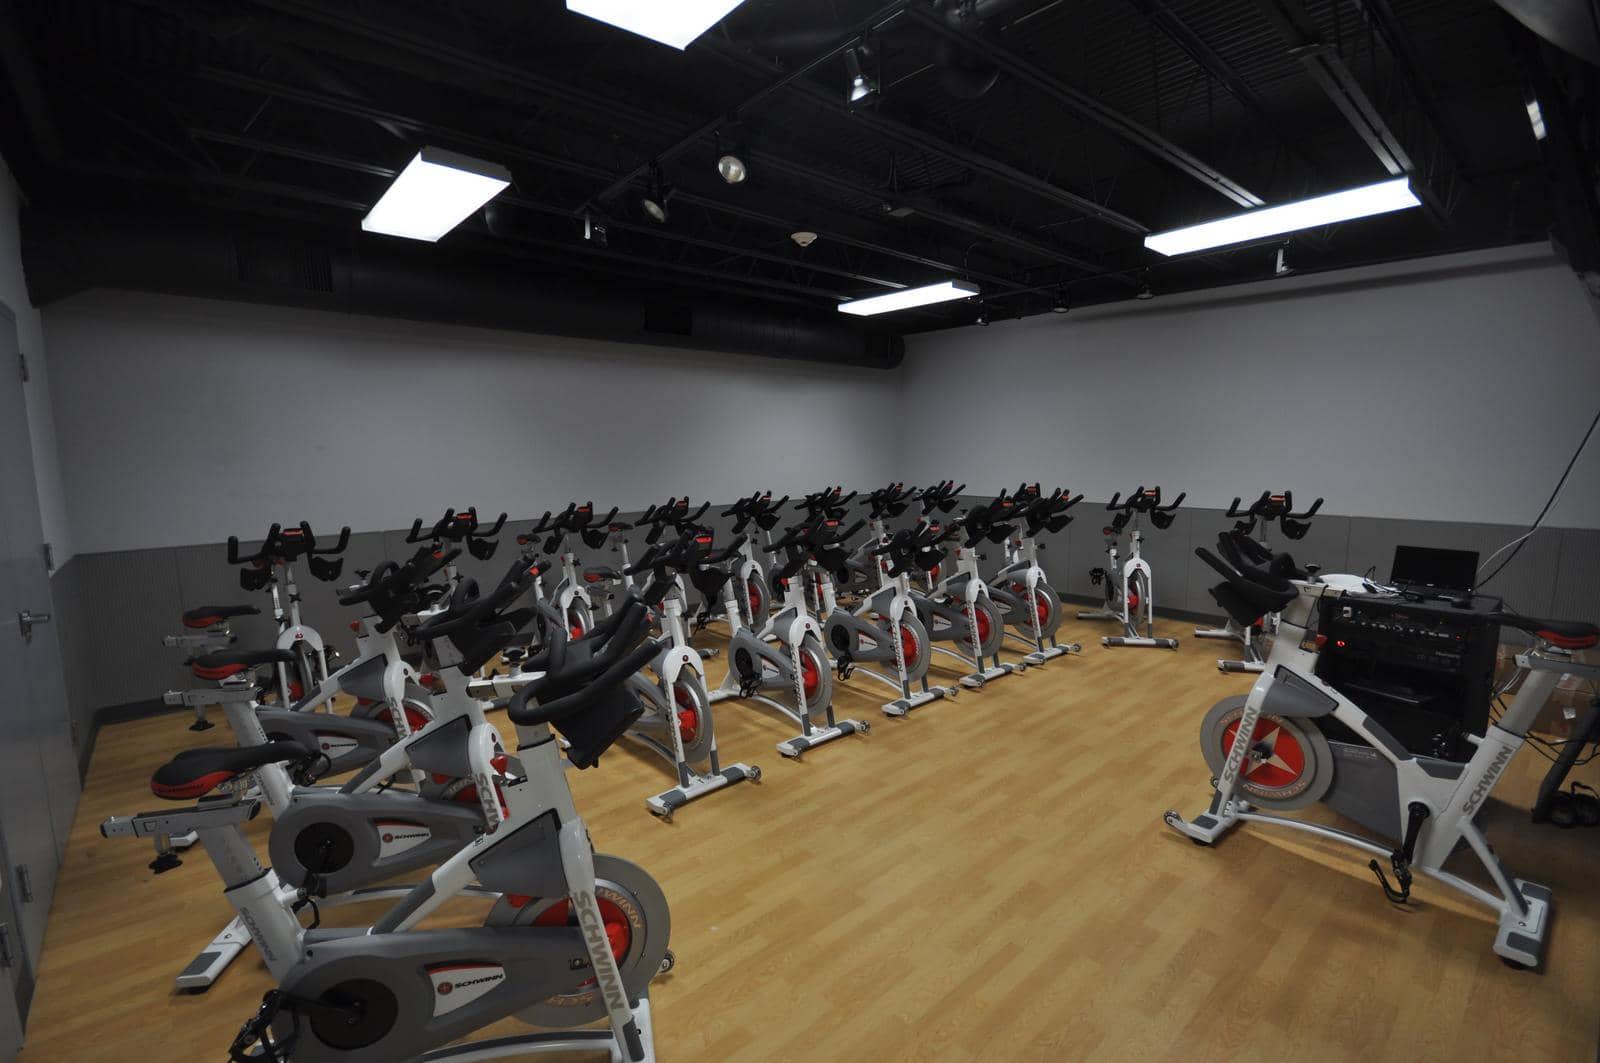 health club flooring for stationary bikes